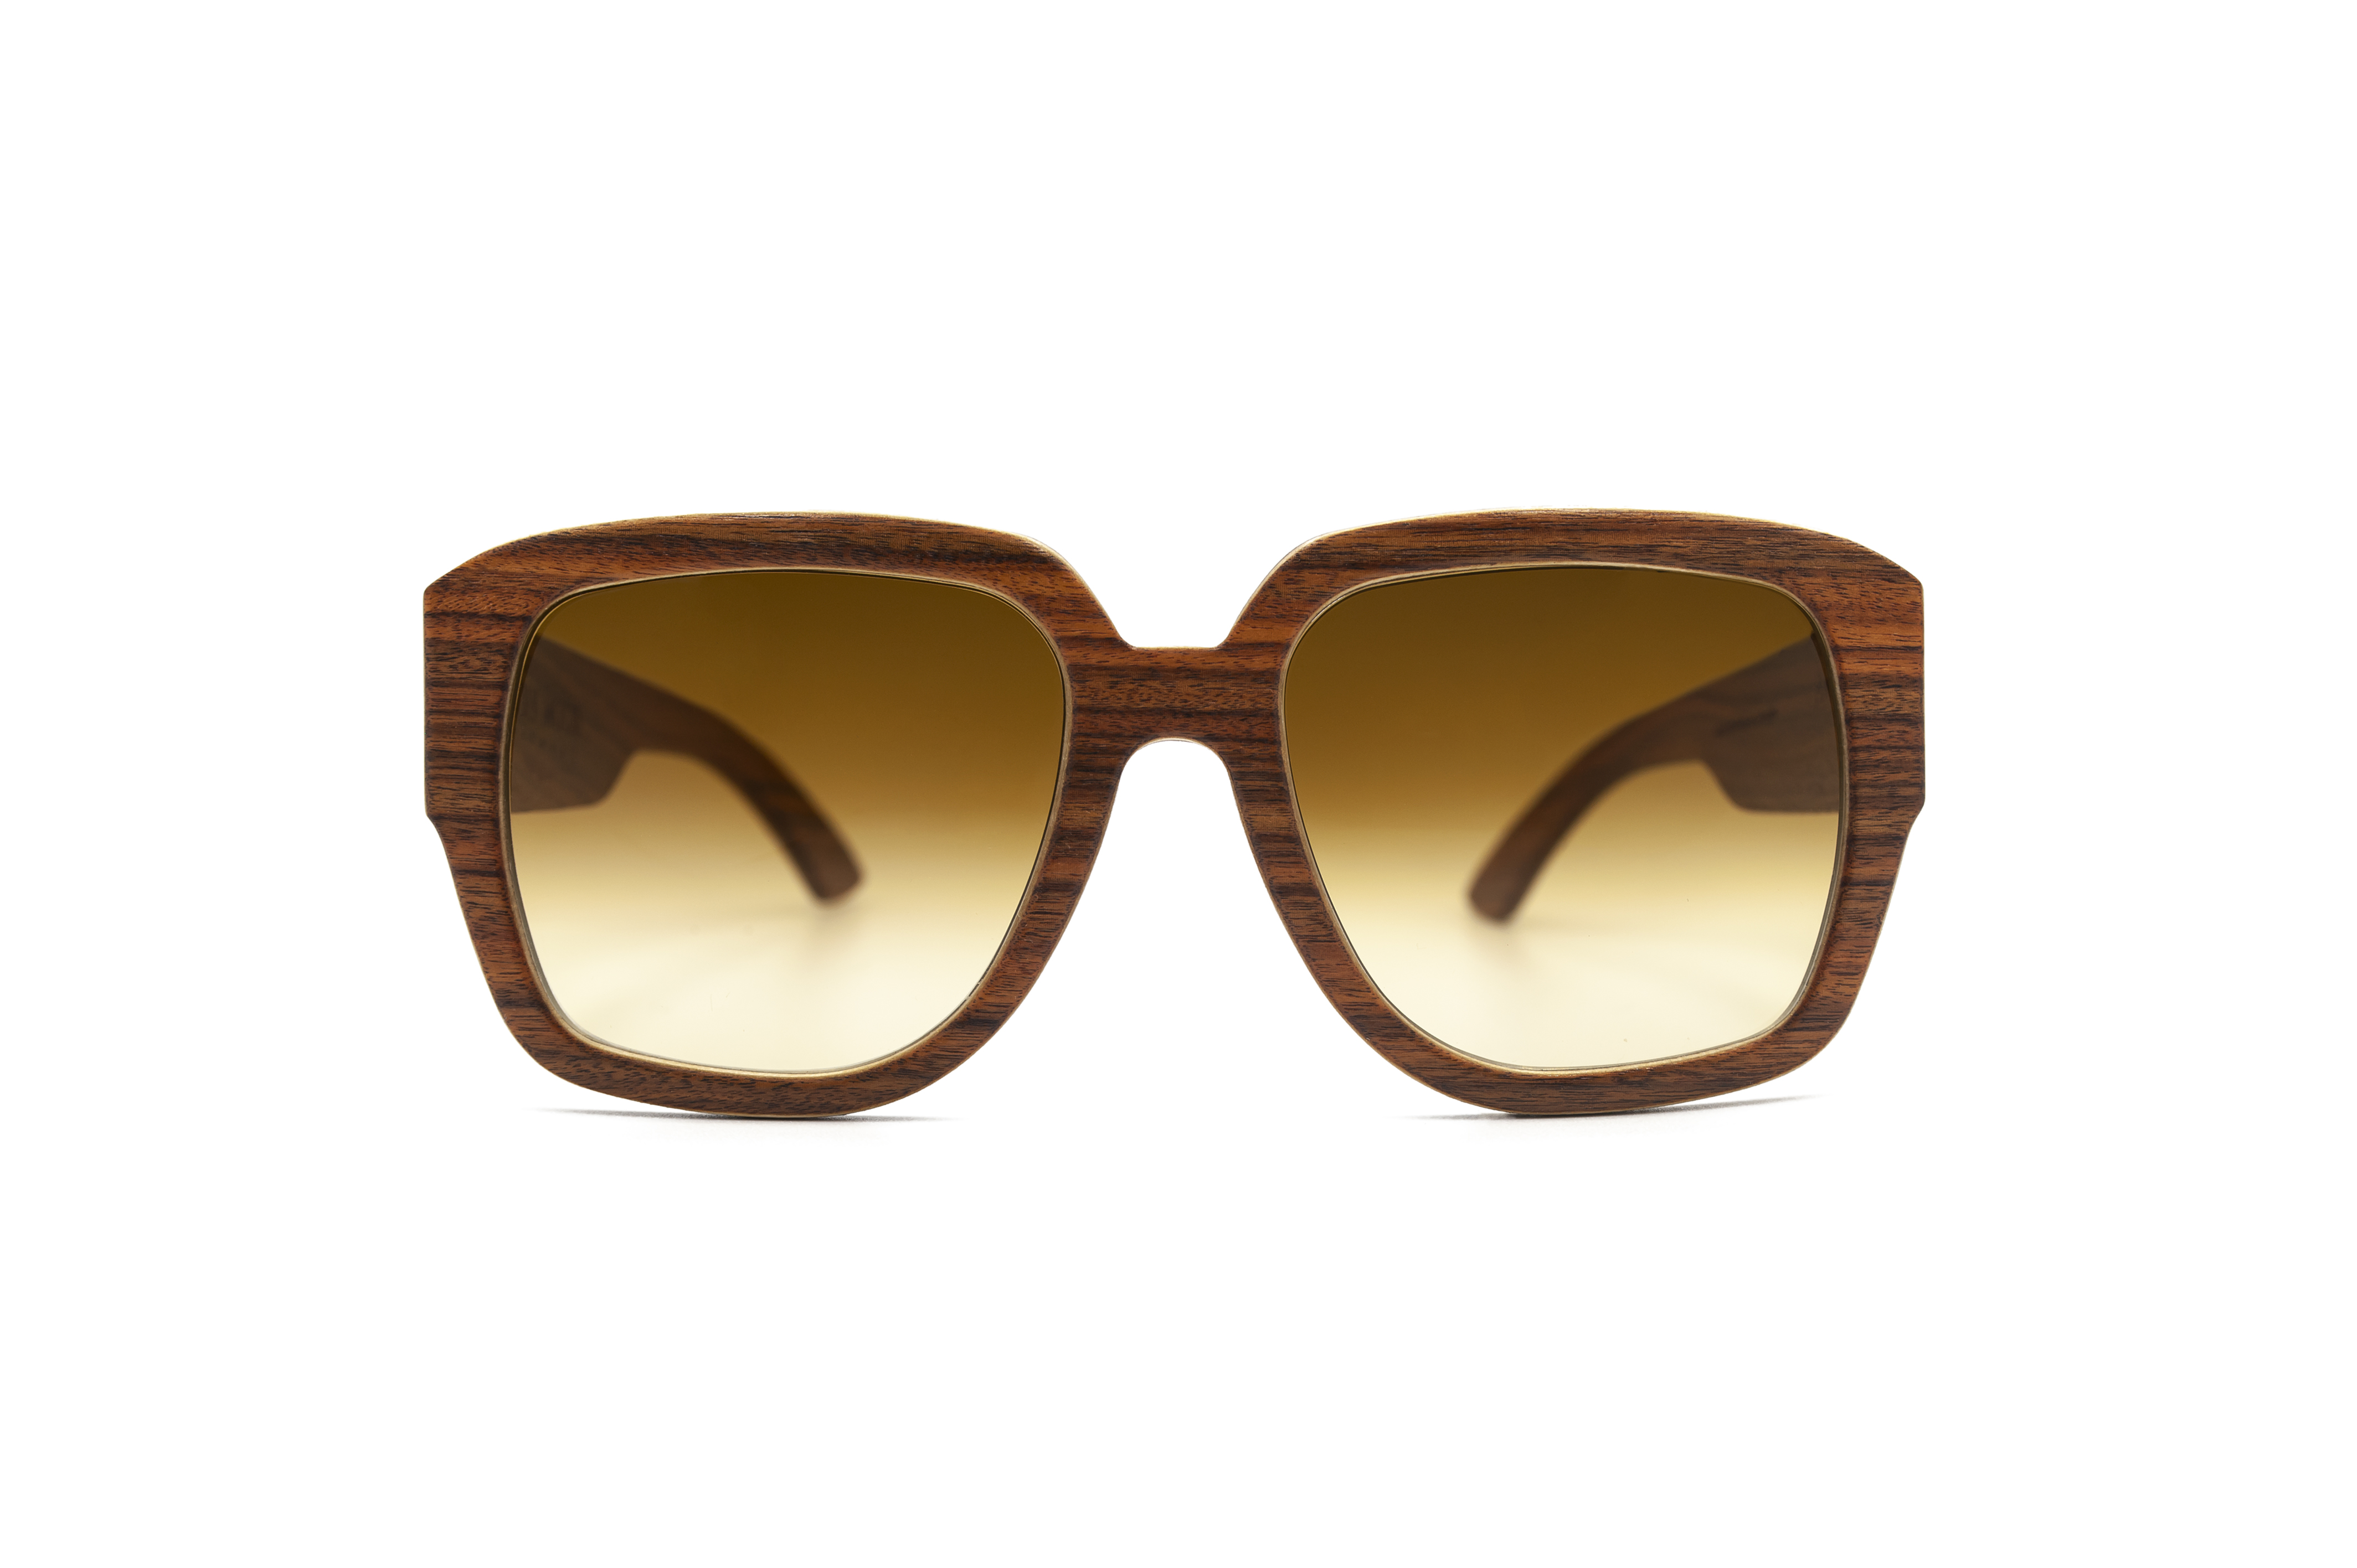 Angus Orange Polisander square Sunglasses Wooden Sunglasses